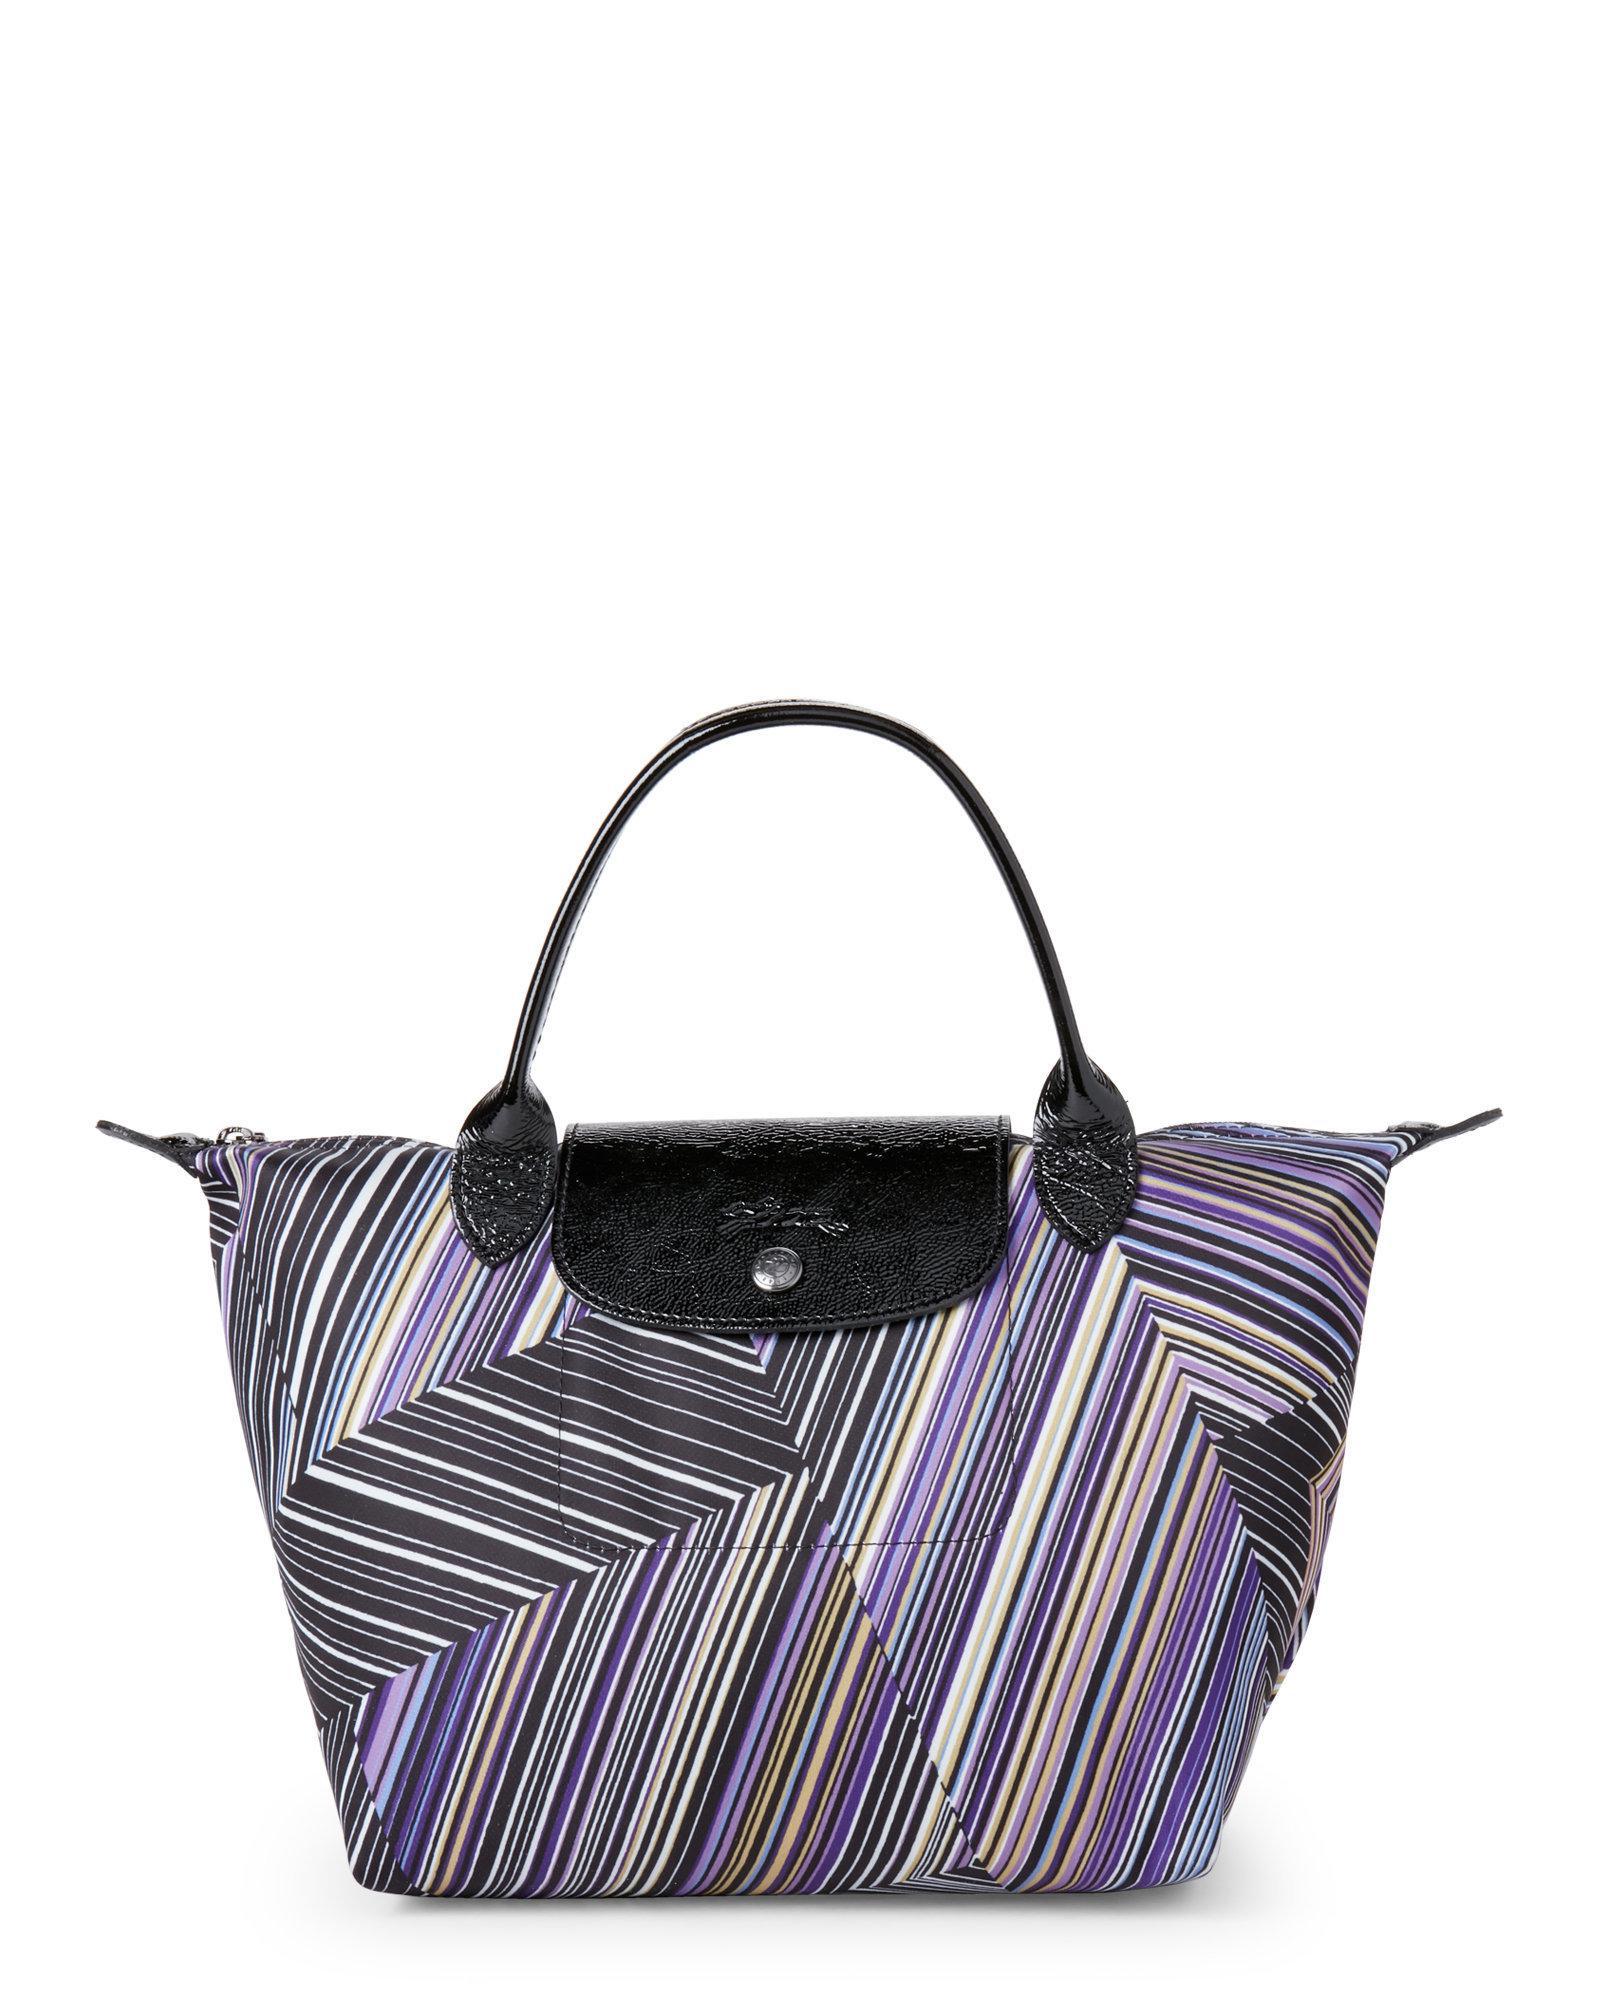 Lyst - Longchamp Op Art Le Pliage Small Top Handle Bag ee5d63449ddd9